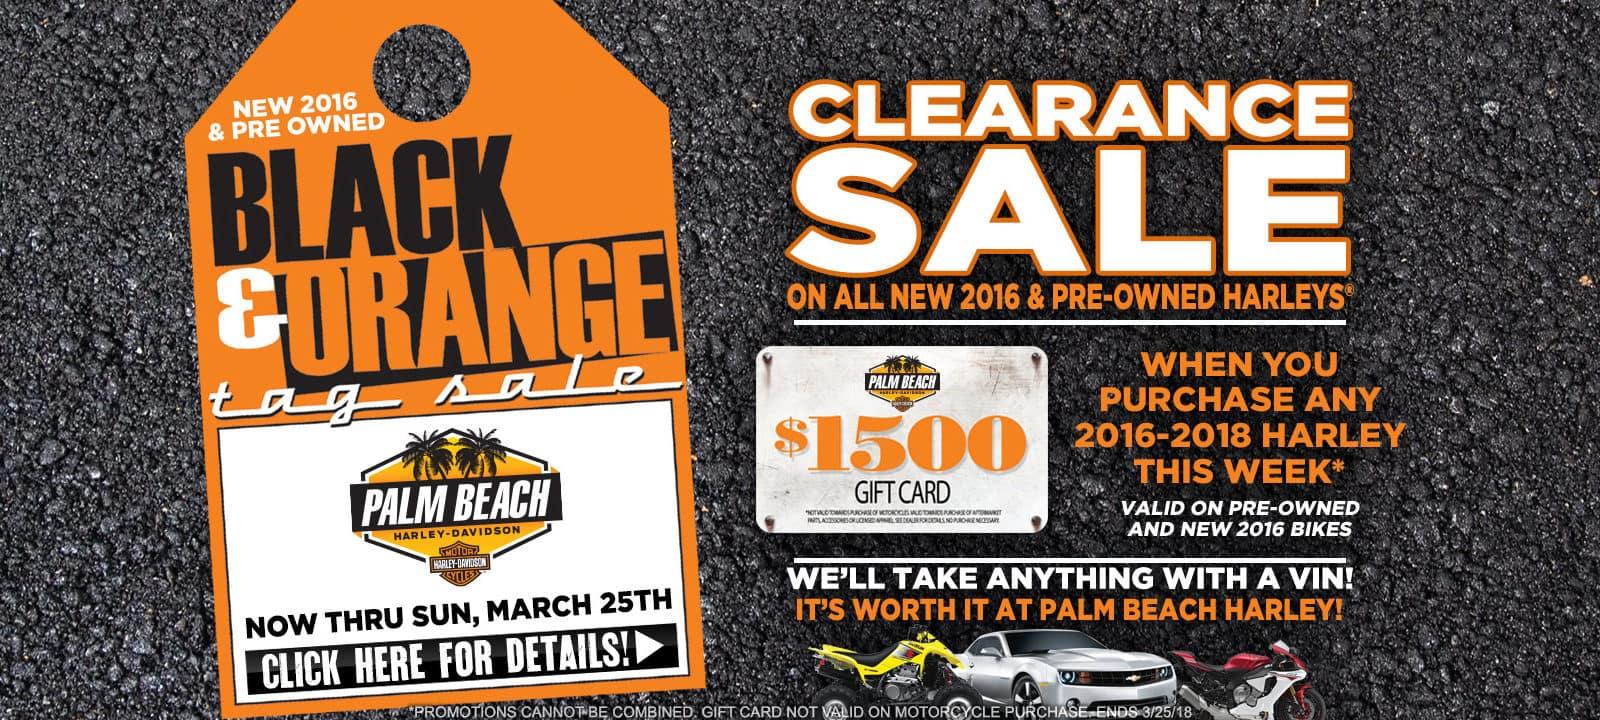 20180319-1800x720-PBHD-Black-&-Orange-Tag-Sale-1500-Gift-Card